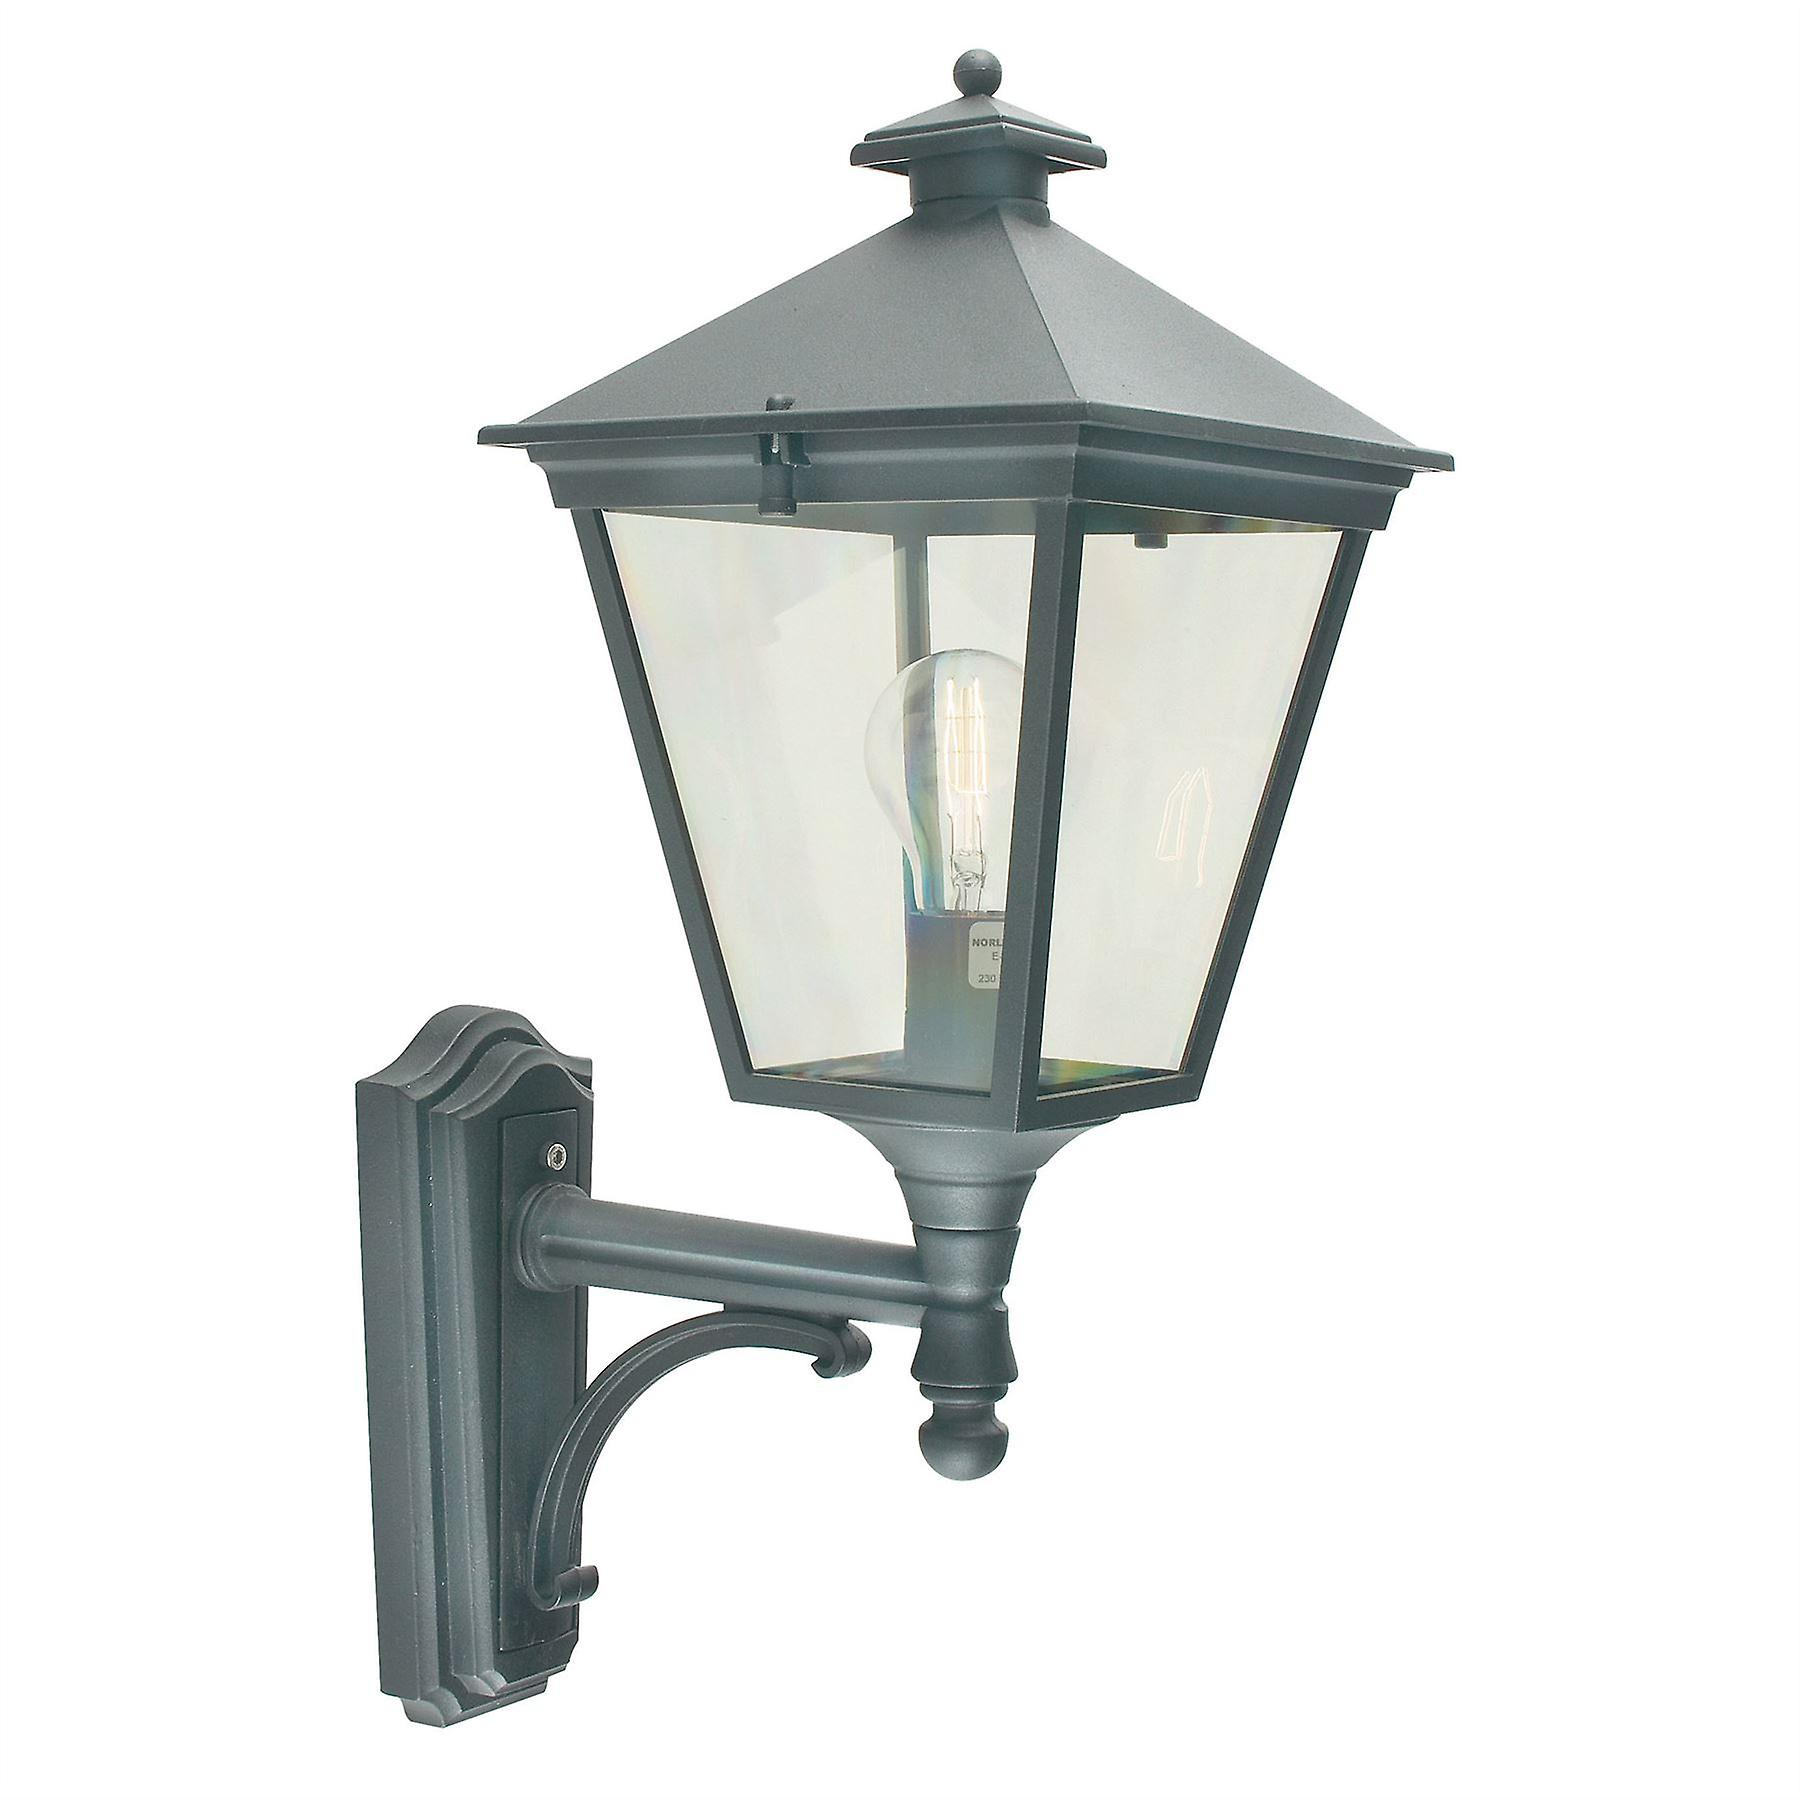 Turin Outdoor Up Wall Lantern - Elstead Lighting T1 noir